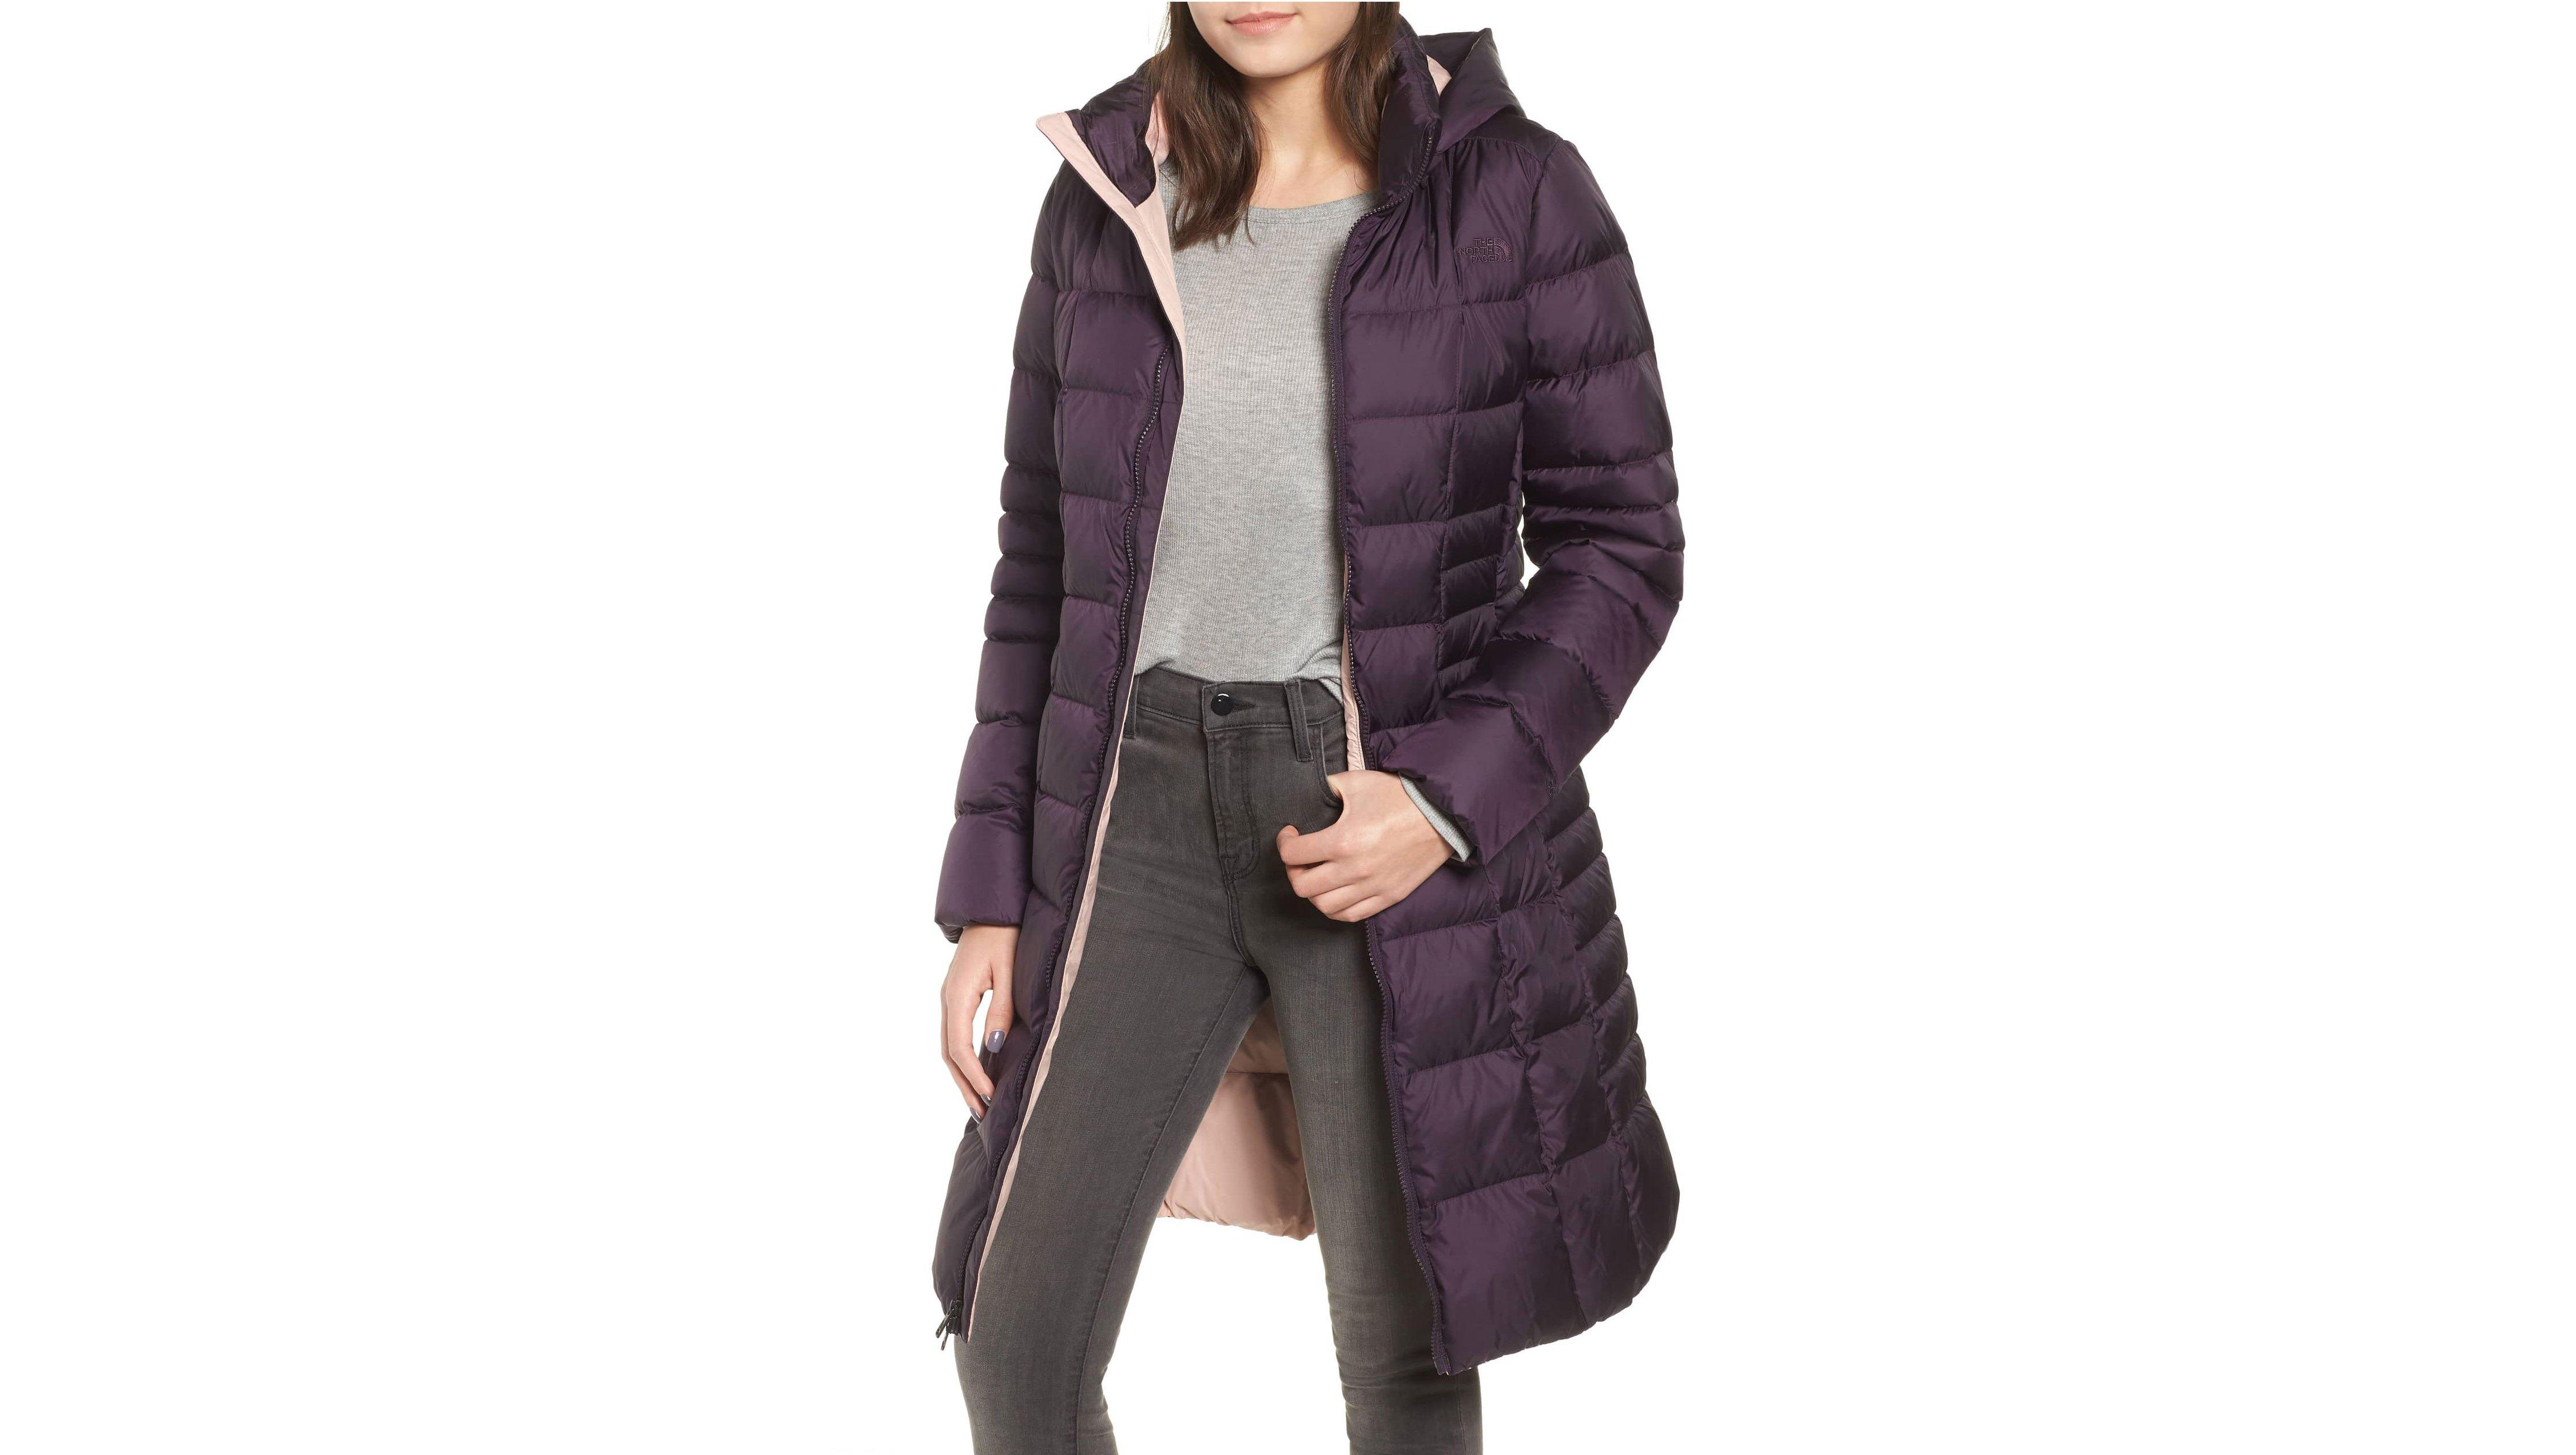 North-Face-Jacket-Metropolis-II-Hooded-Water-Resistant-Down-Parka